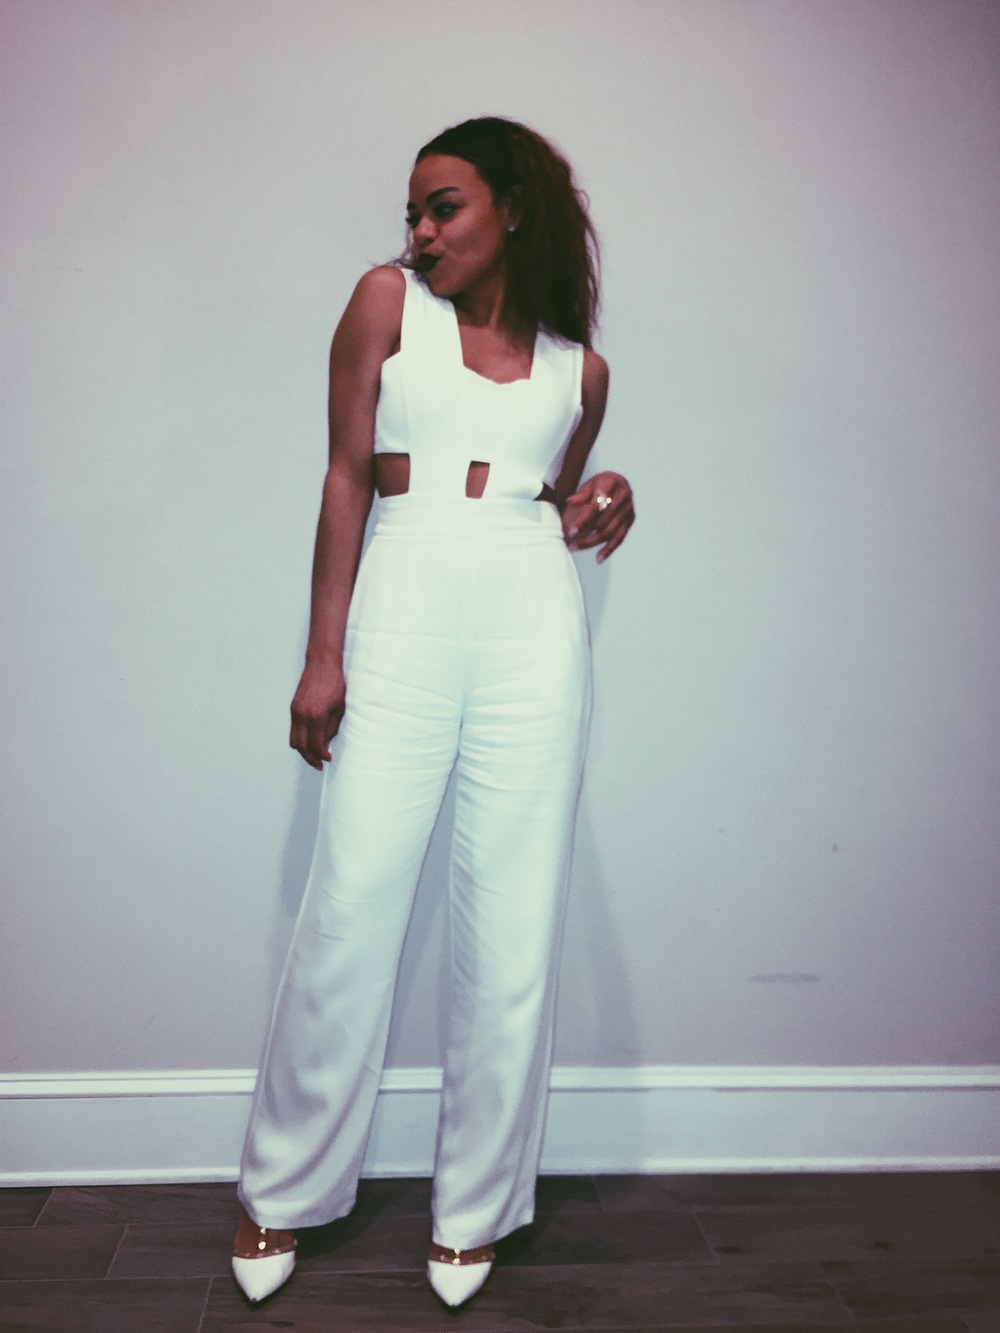 Wearing: Karina Grimaldi jumpsuit and BCBG heels